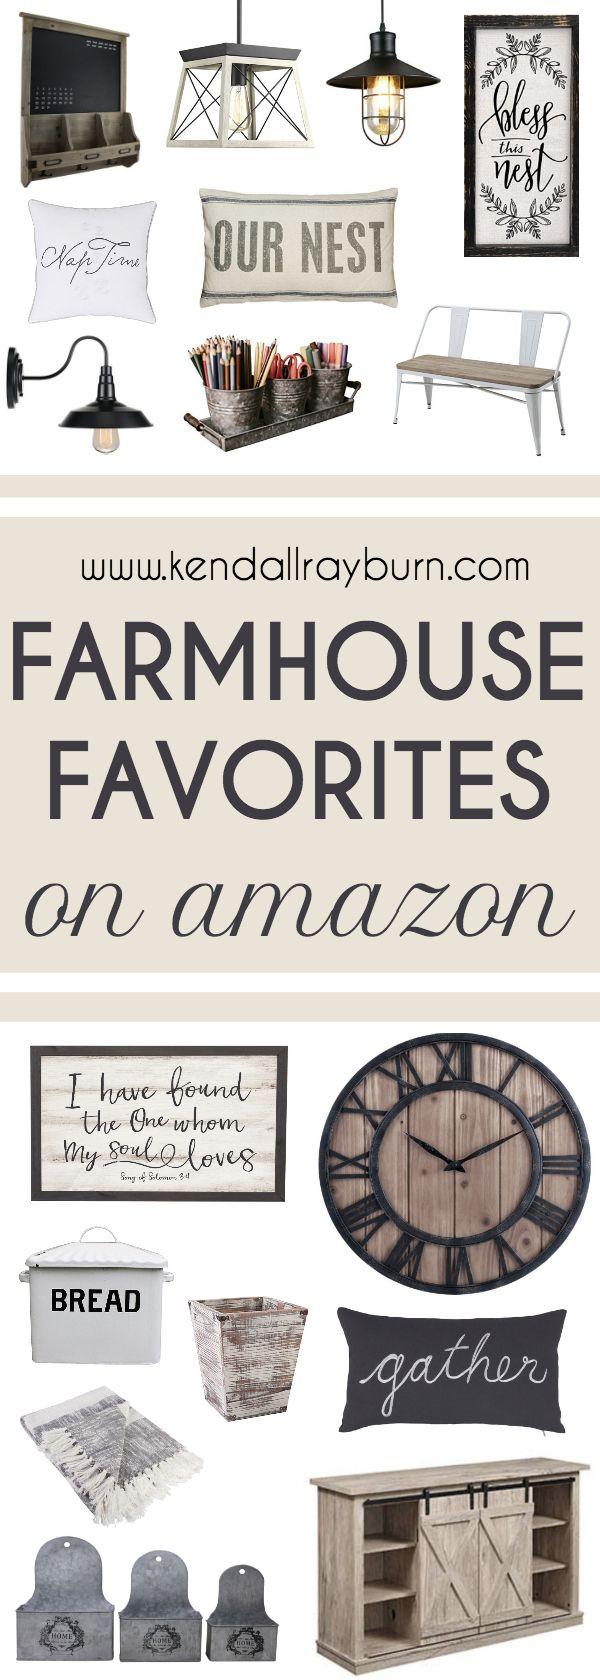 Farmhouse Home Decor on Amazon - here are some #farmhouse #fixerupperstyle decor items for the home! #affiliate #fixerupper #farmhouse